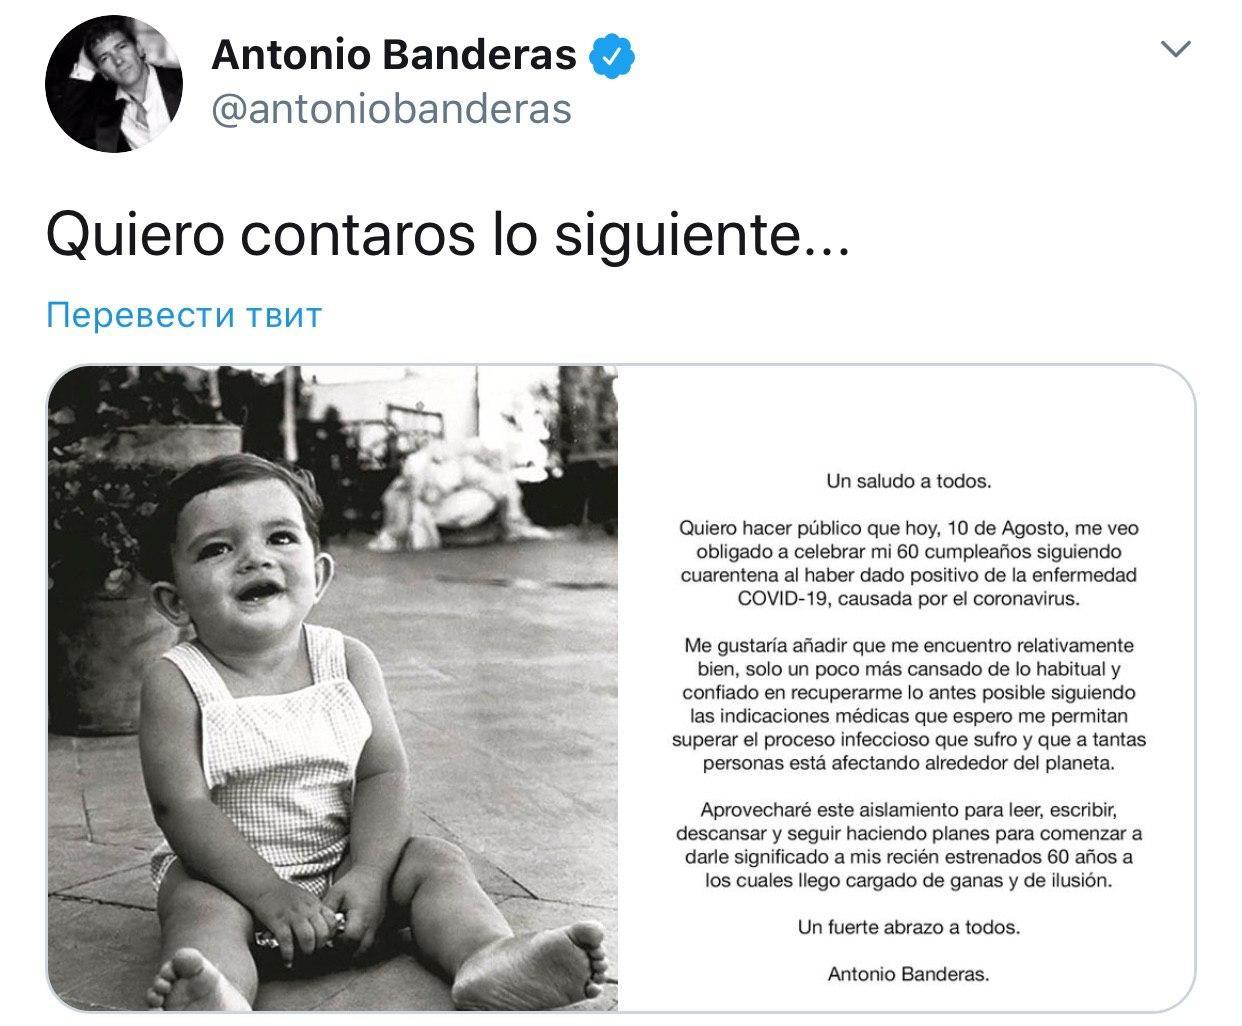 Пост Антонио Бандераса в Twitter. Скриншот: Ракурс